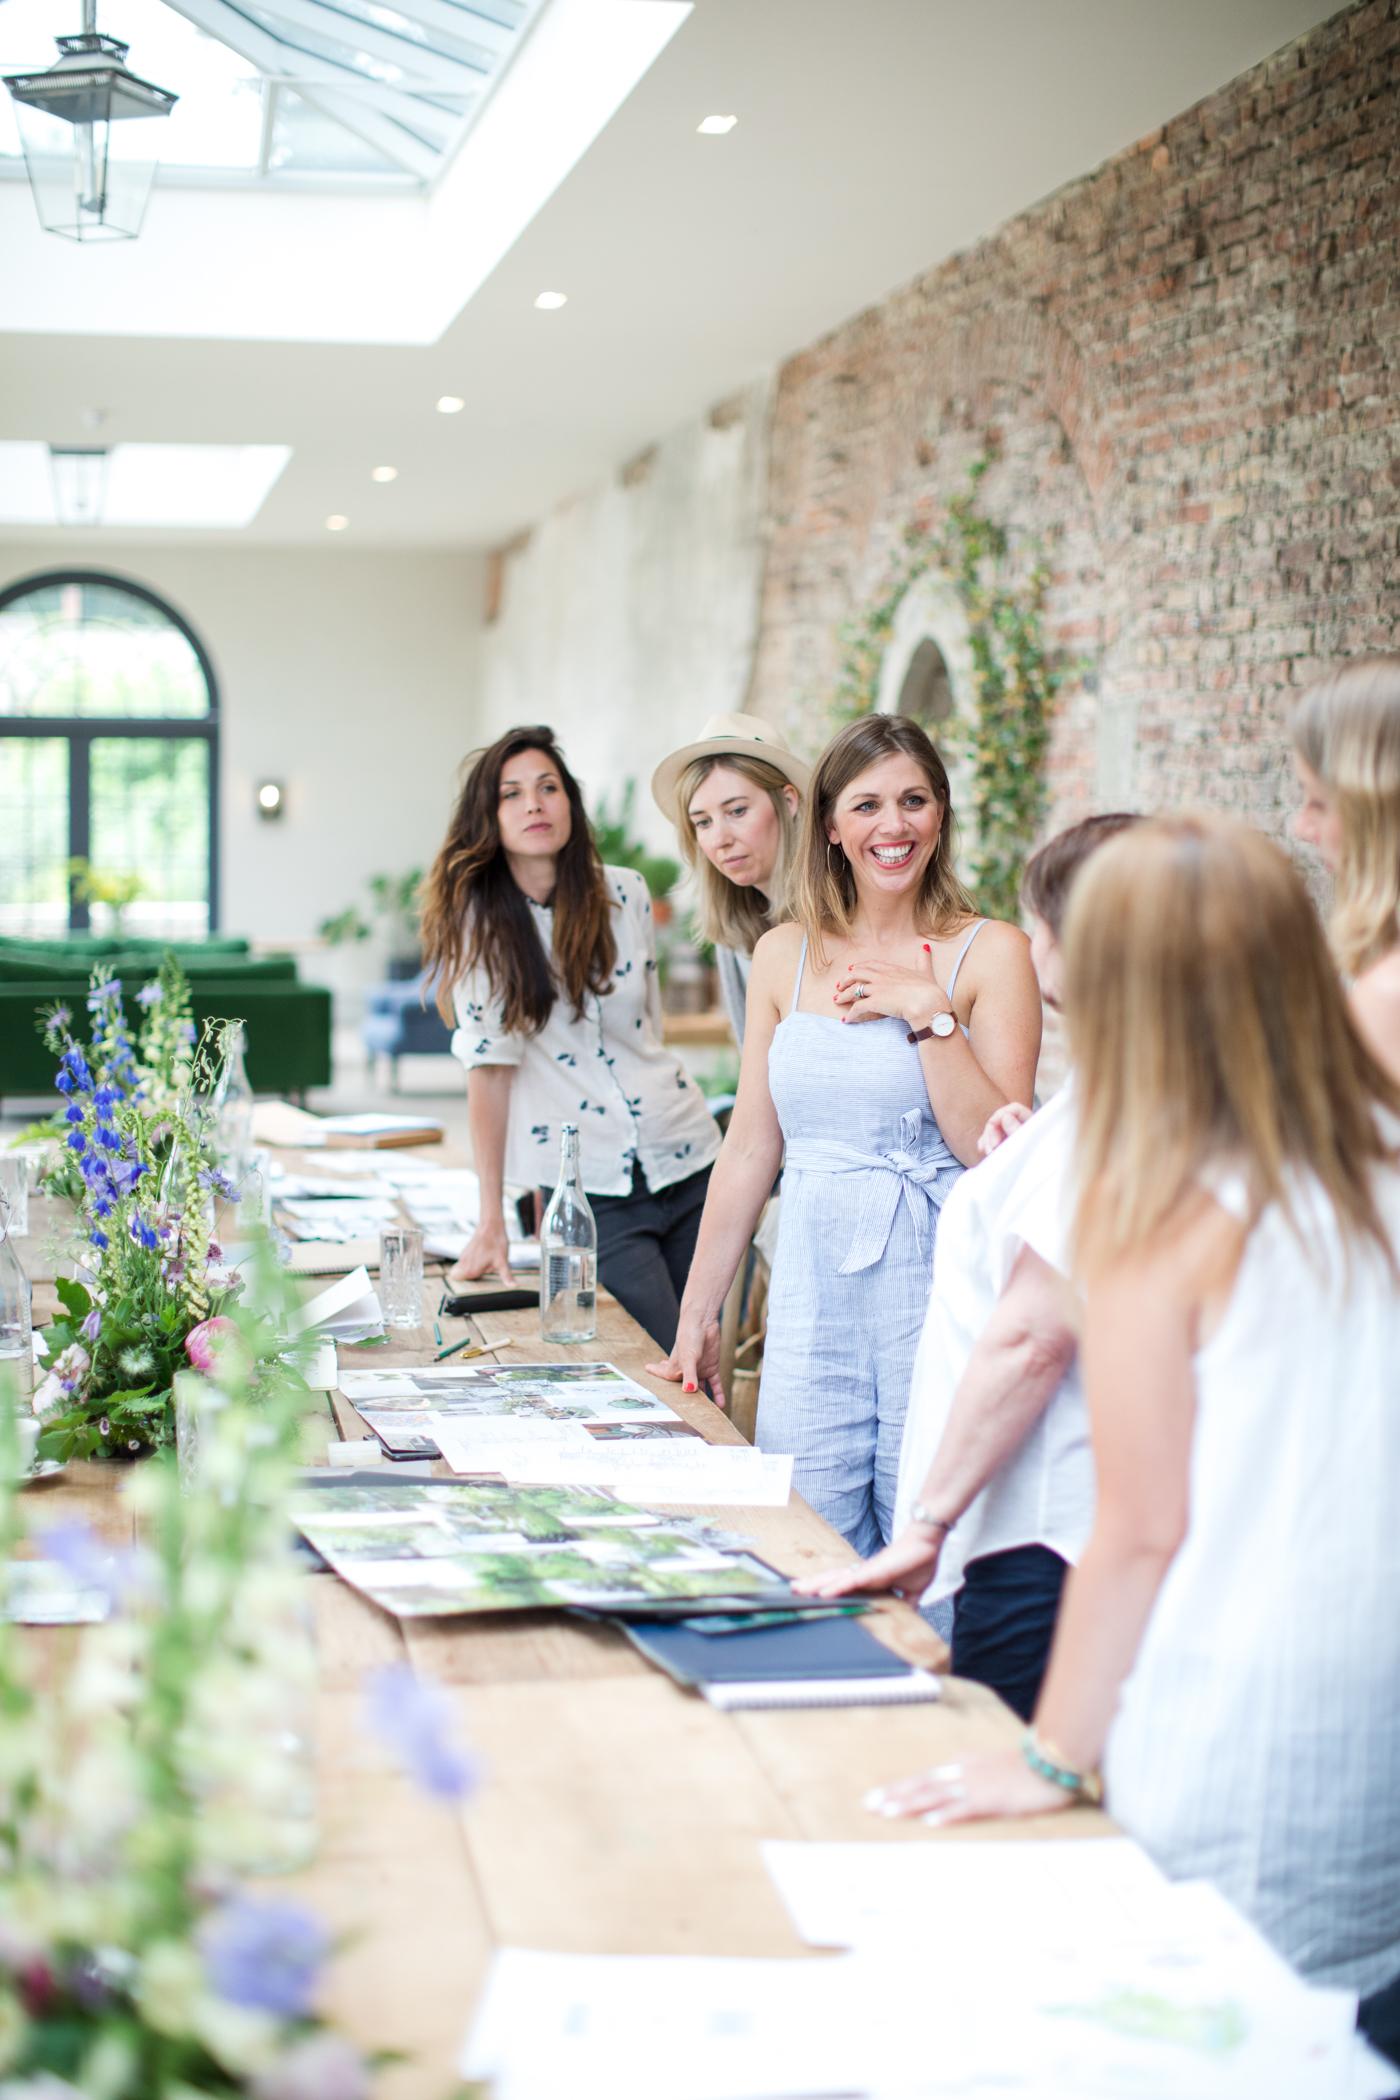 Fiona Humberstone | Creative Flair | Freelance Wisdom